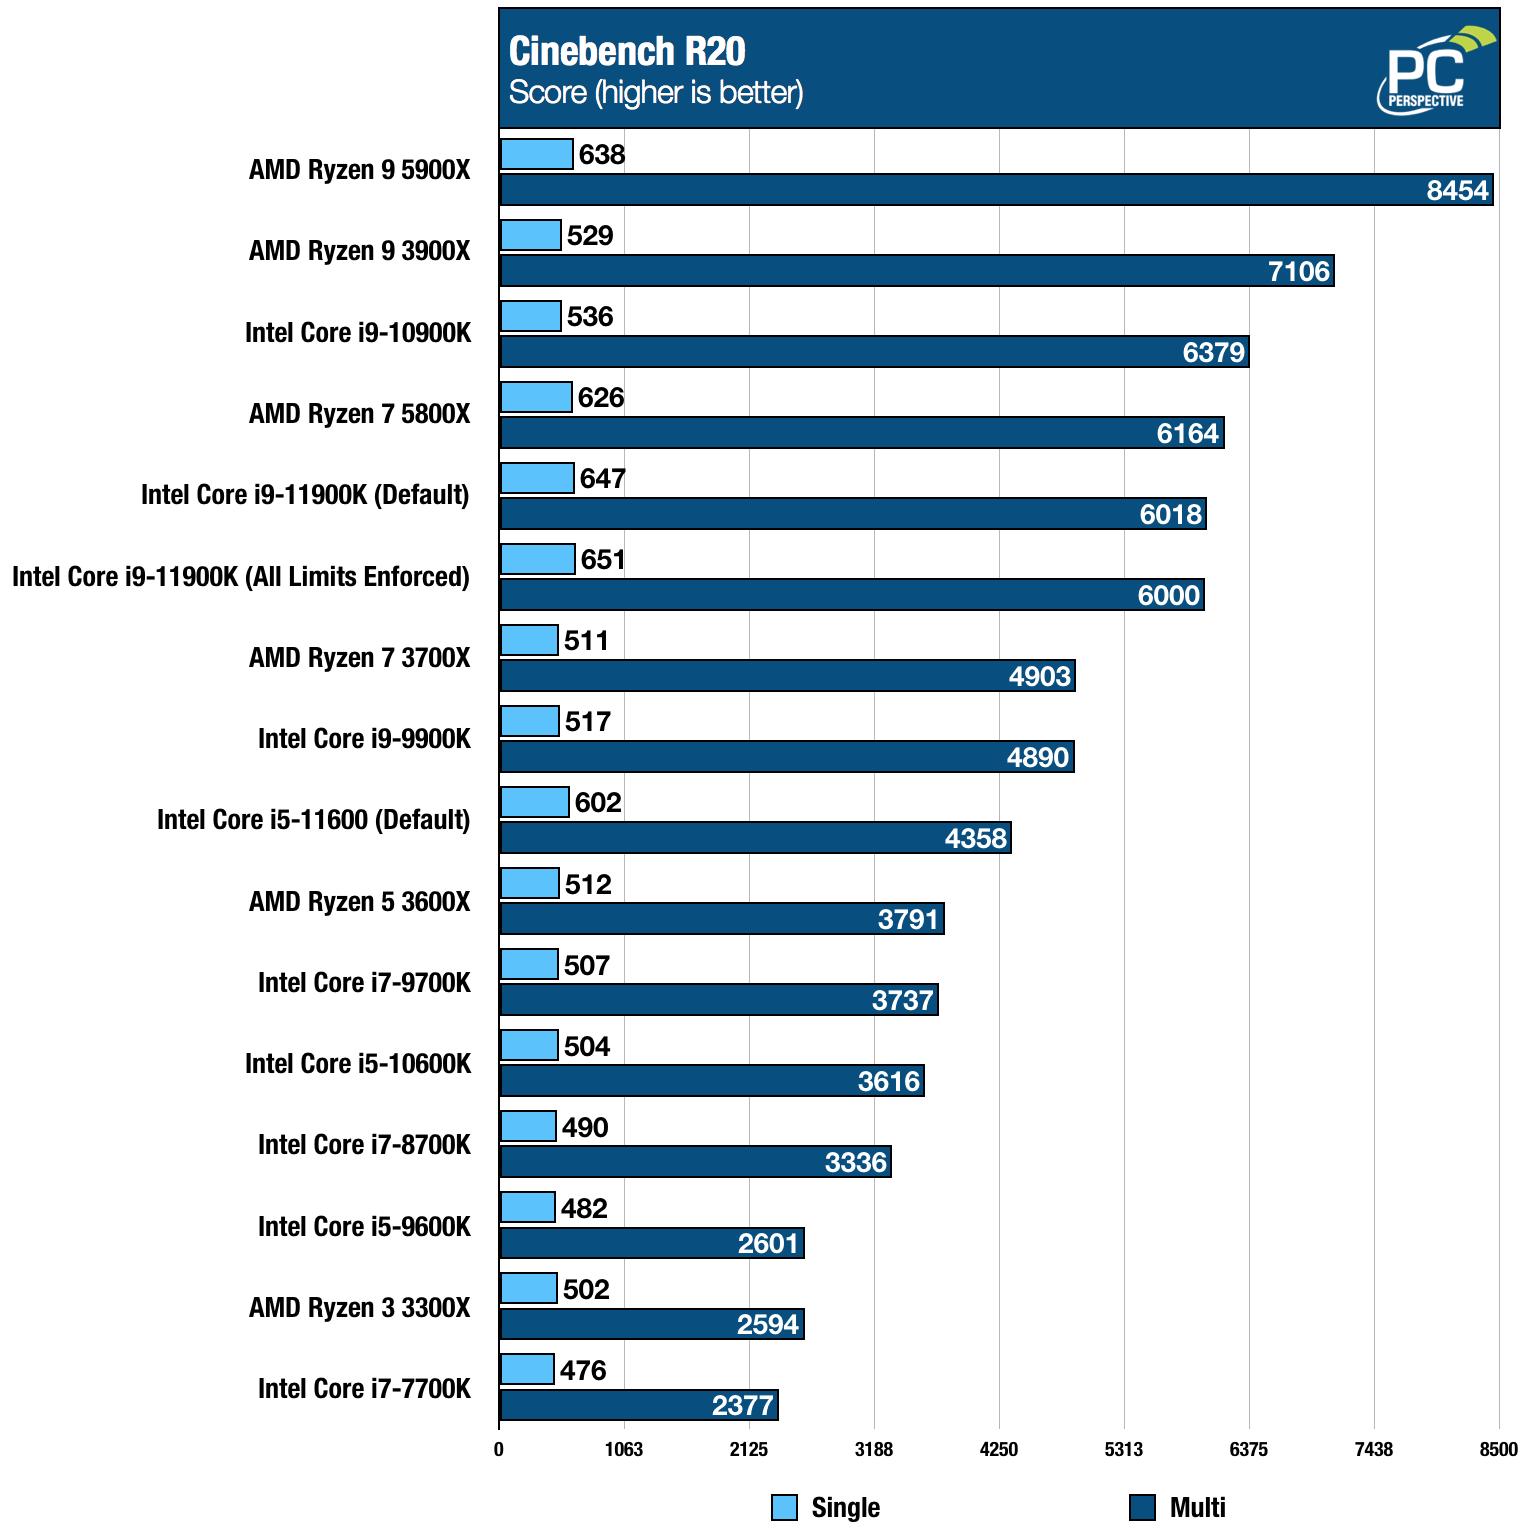 Intel Core i9-11900K i5-11600K Cinebench Chart